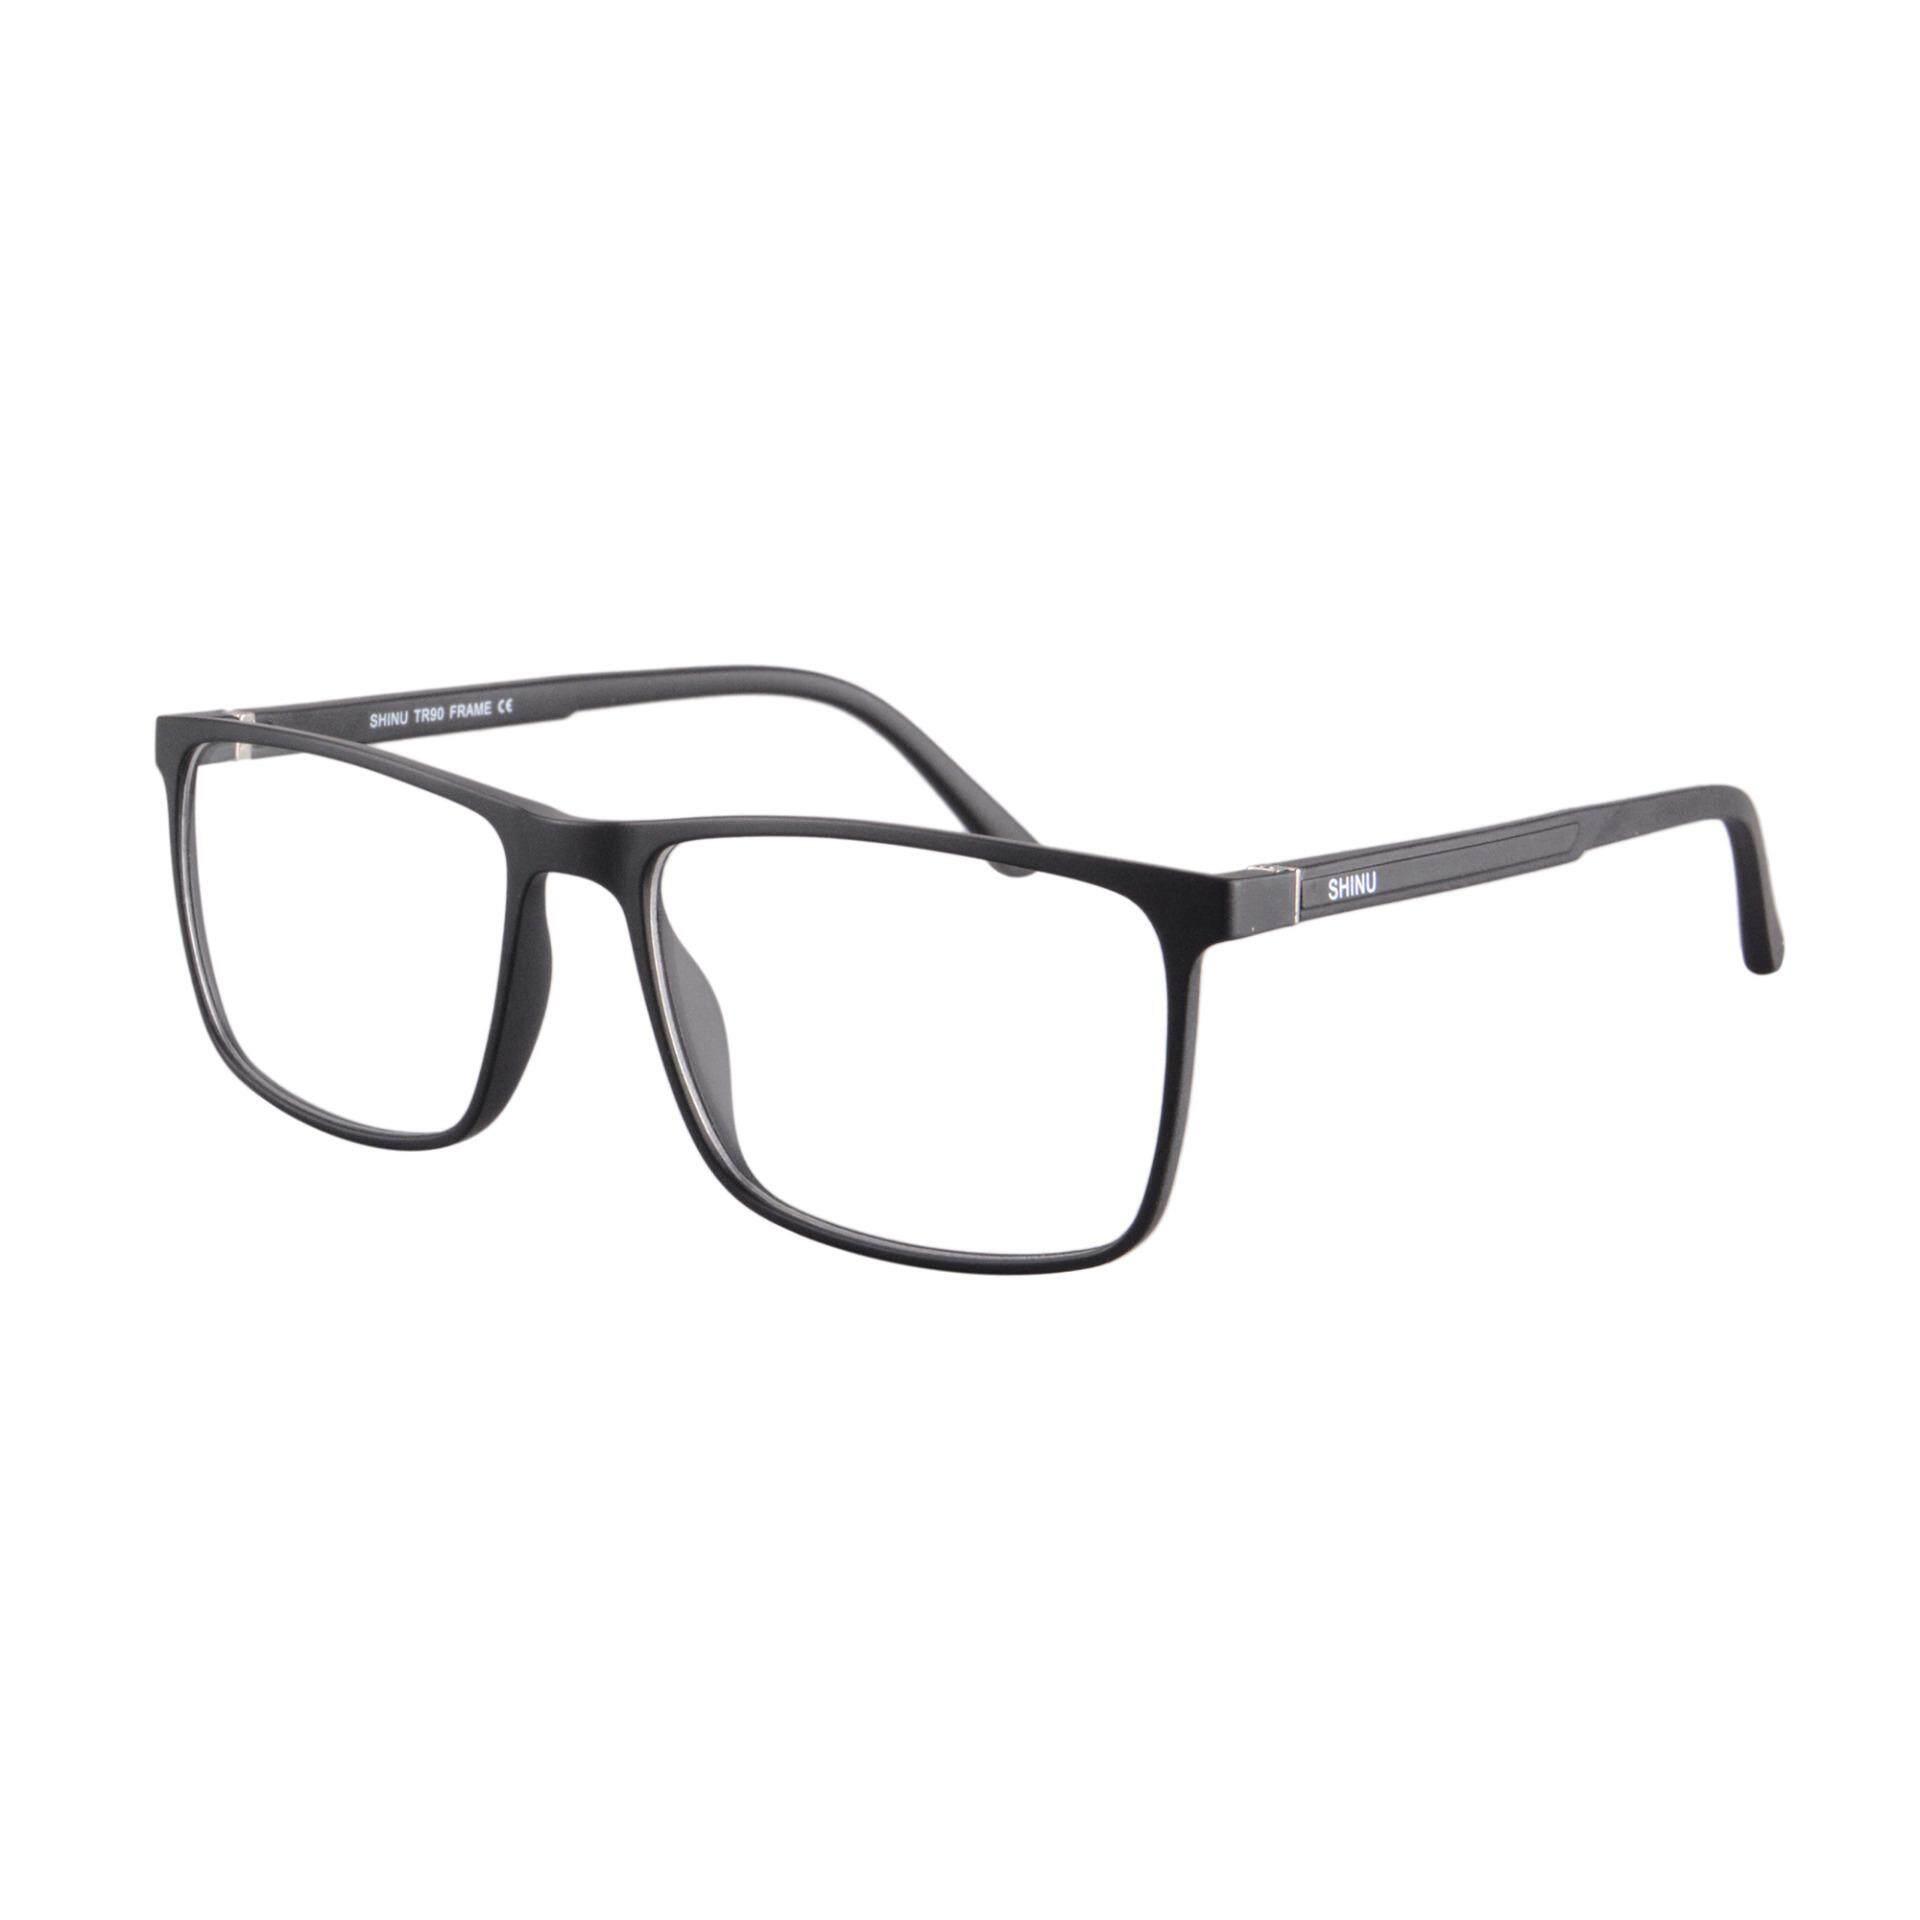 Mens Fashion Glasses for sale - Designer Glasses for Men online ...